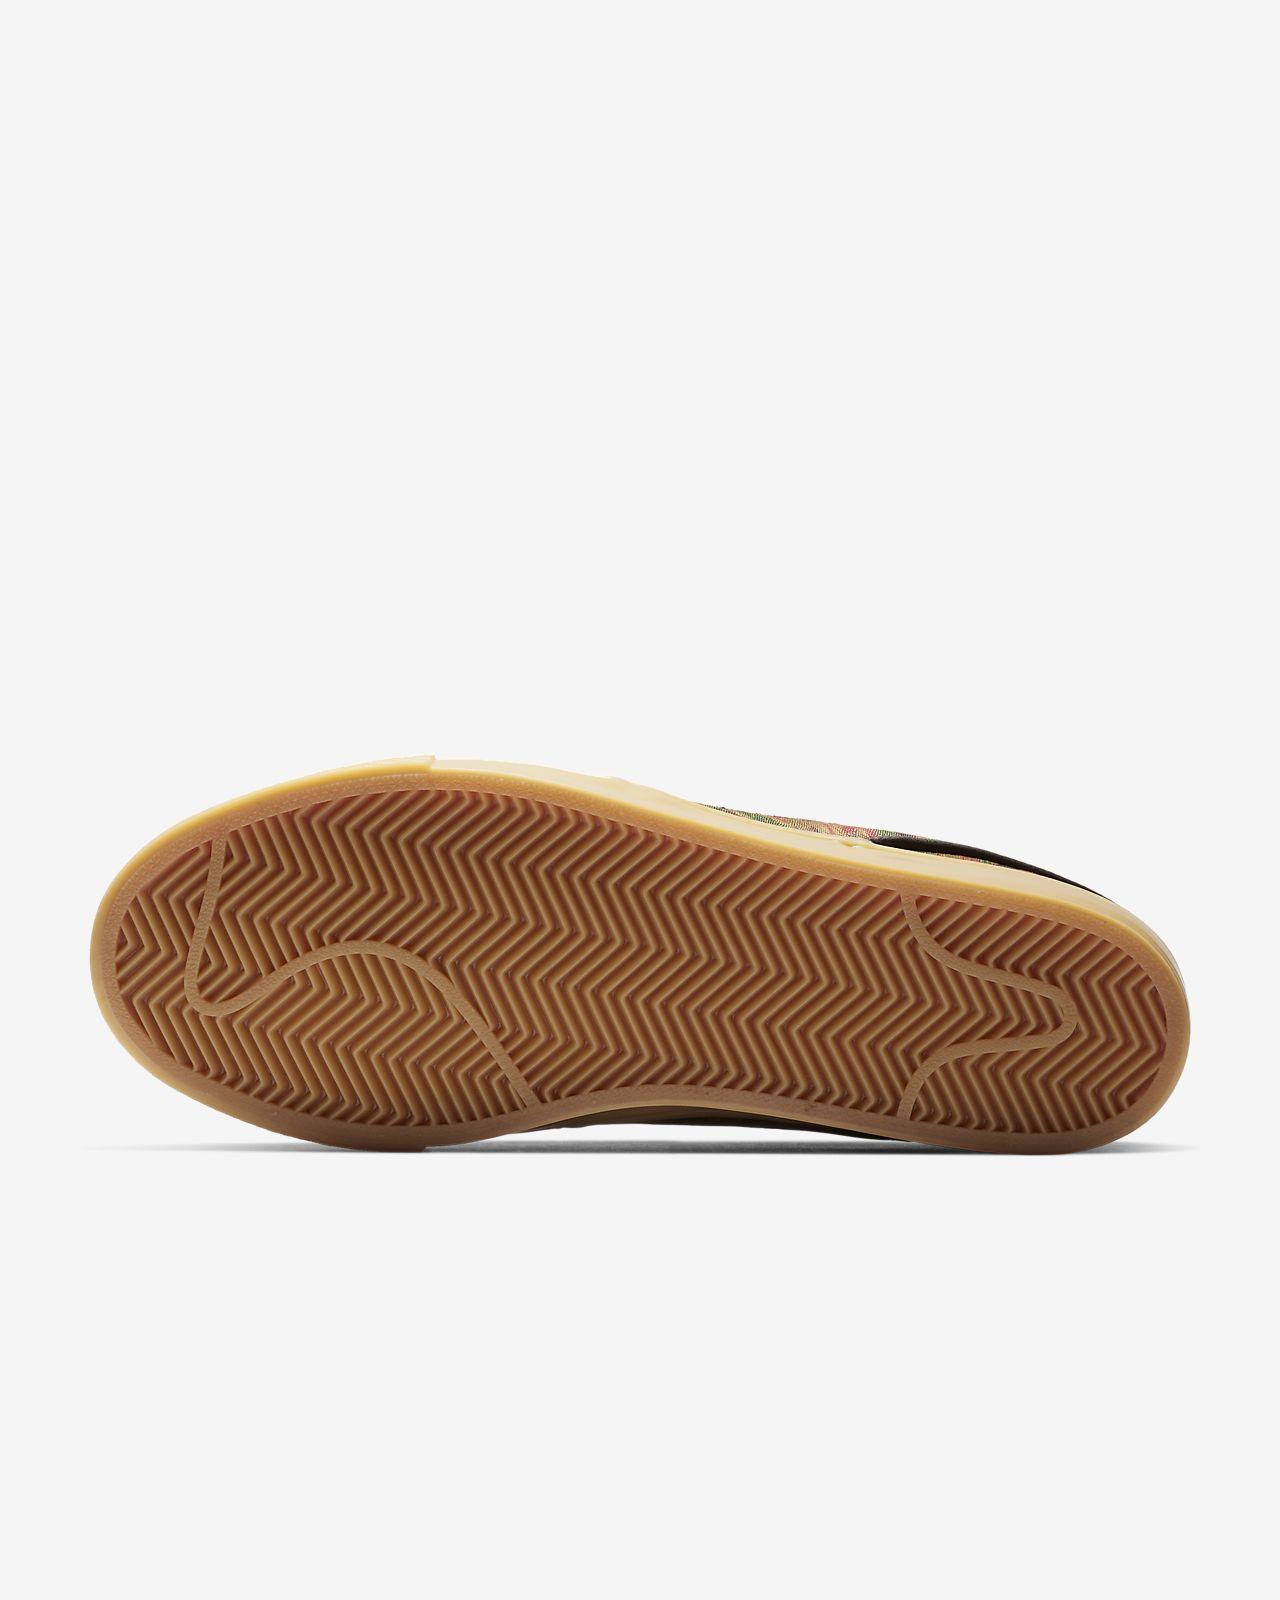 5d5421851801 Nike SB Zoom Stefan Janoski Canvas Premium Men s Skateboarding Shoe ...